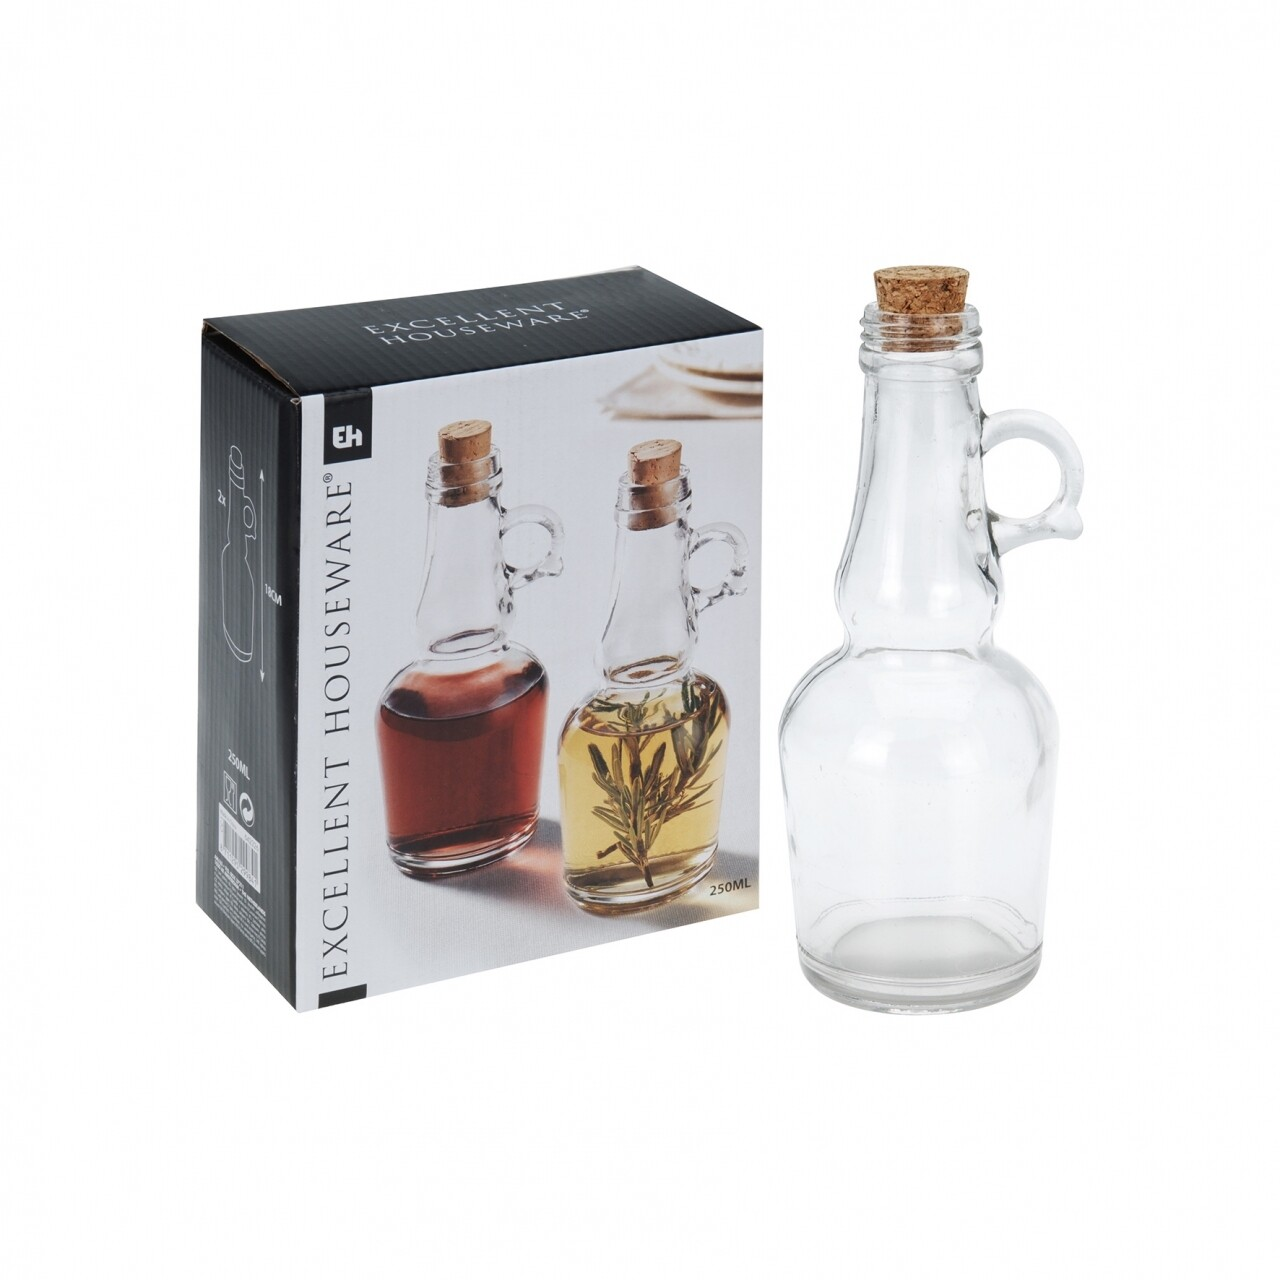 Oliviera cu dop, 21 x 32 x 45 cm, sticla/pluta, transparenta